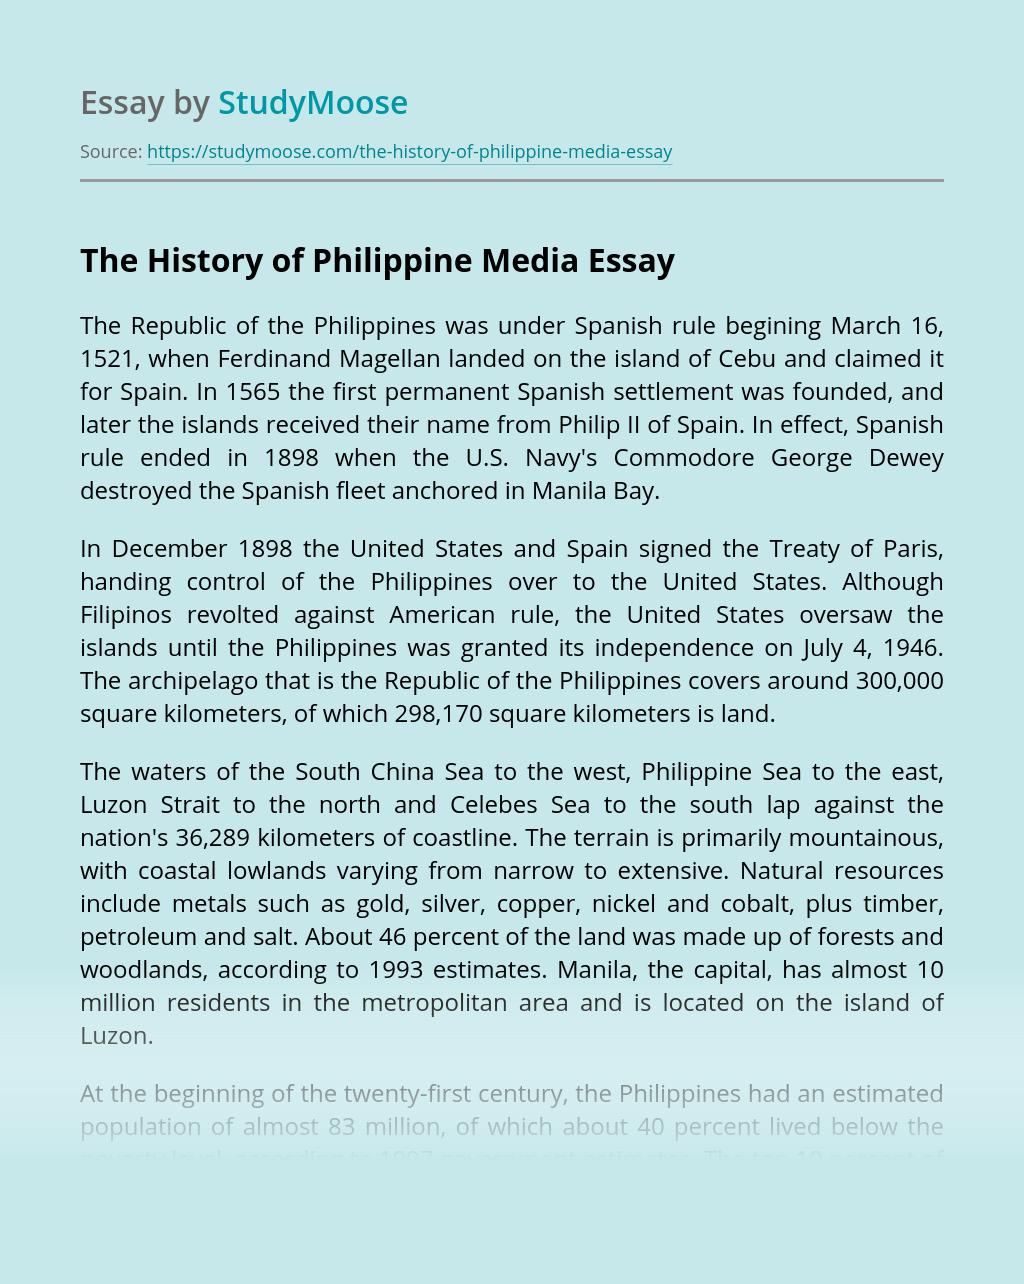 The History of Philippine Media